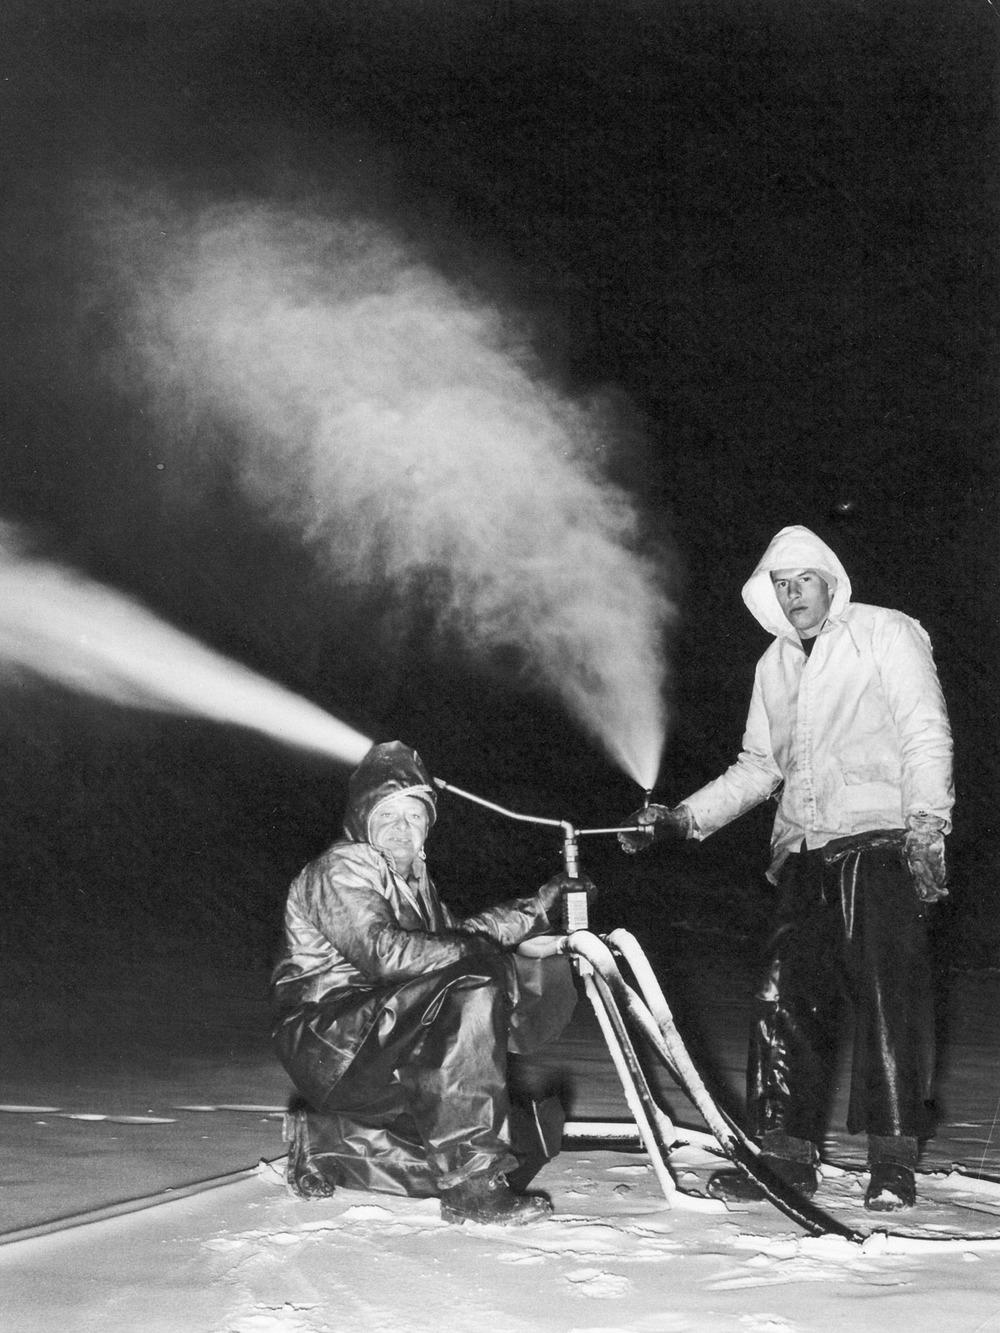 Bob Ely & Frank Brock snowmaking